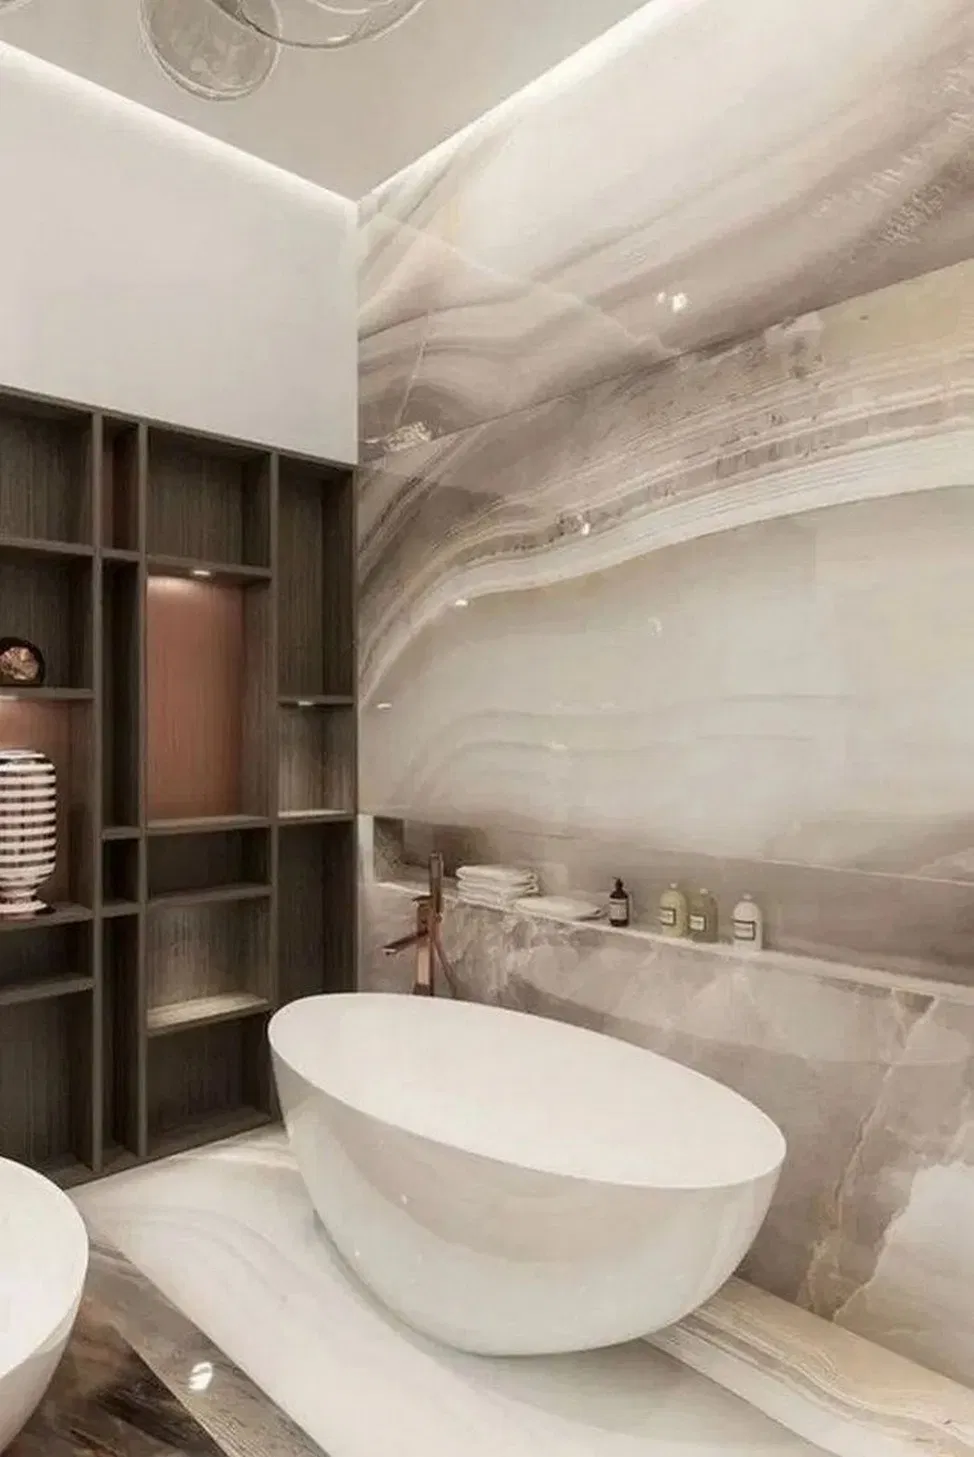 31 Bathroom Inspiration Modern Small Ideas 15 Megasiana Com Bathroomideas Bathroominterior Smallbat Modern Bathroom Design Luxury Bathroom Dream Bathrooms